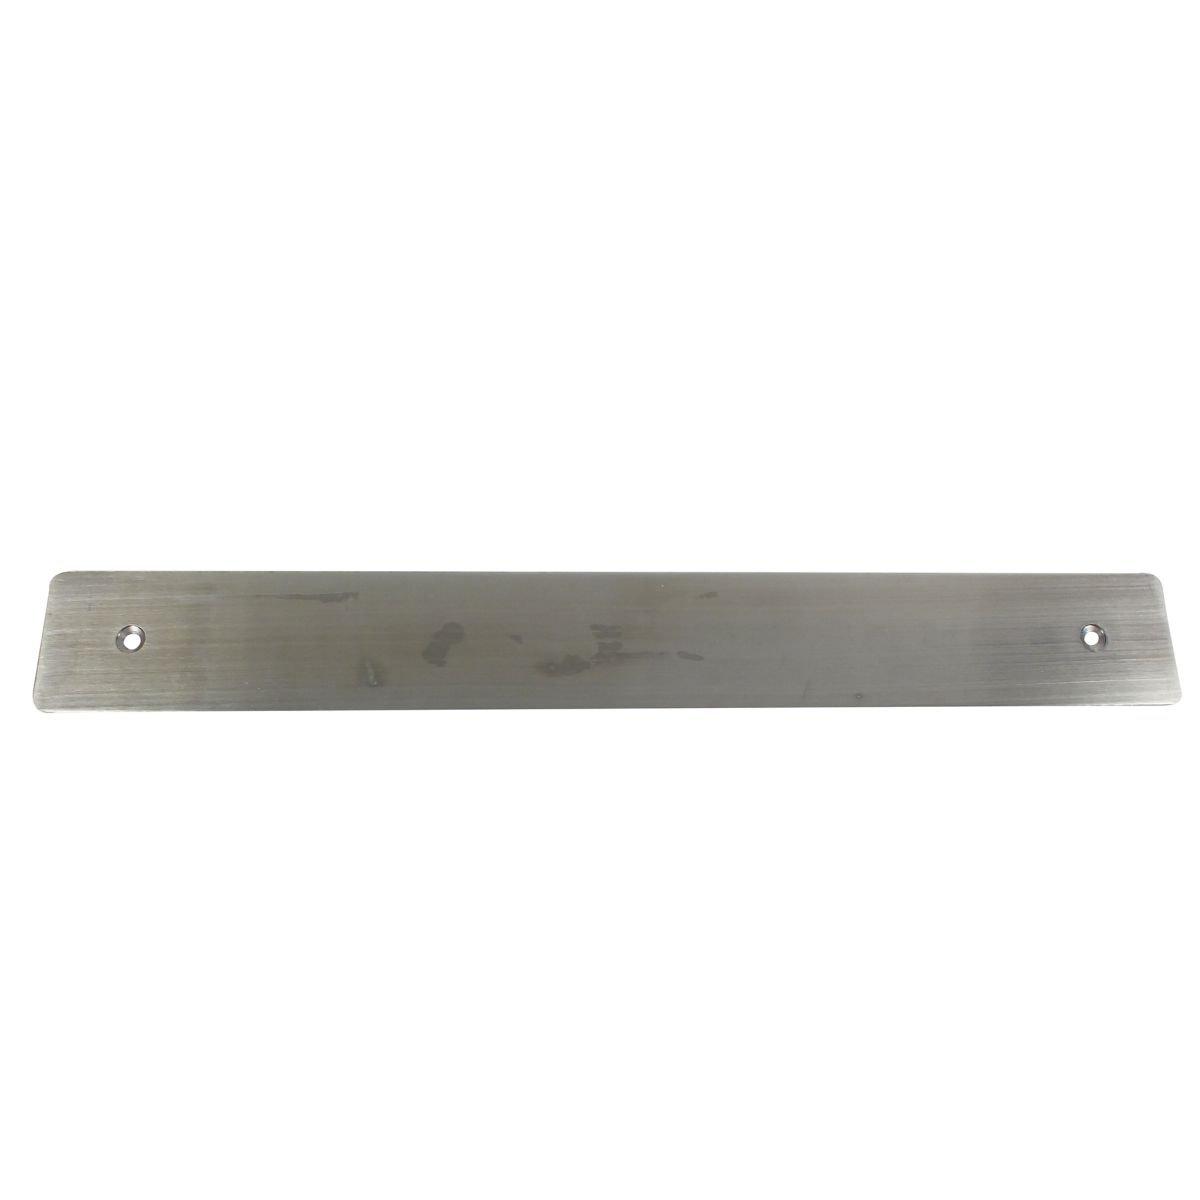 Kela 15715 magnetleiste, 36 cm länge, edelstahl matt, plan: amazon ...